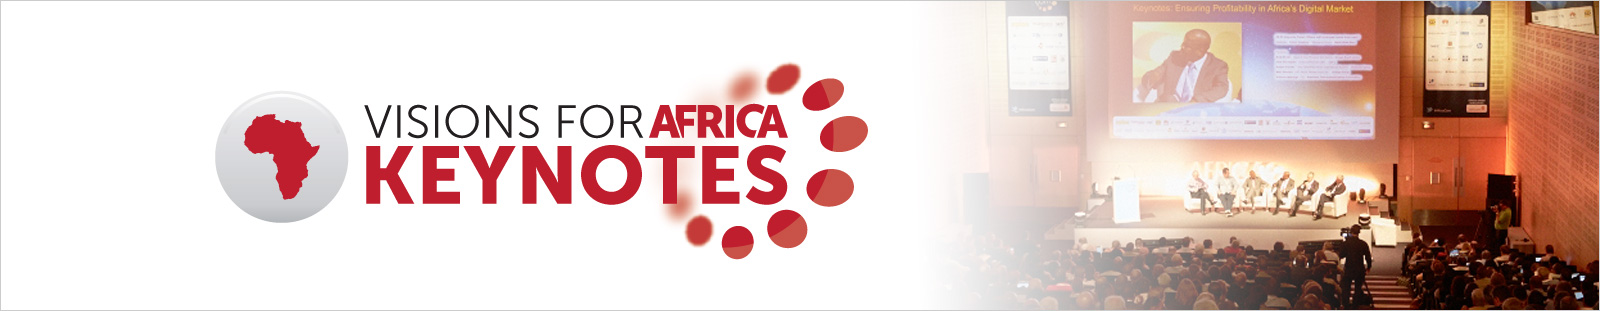 header-vision-africa-keynotes